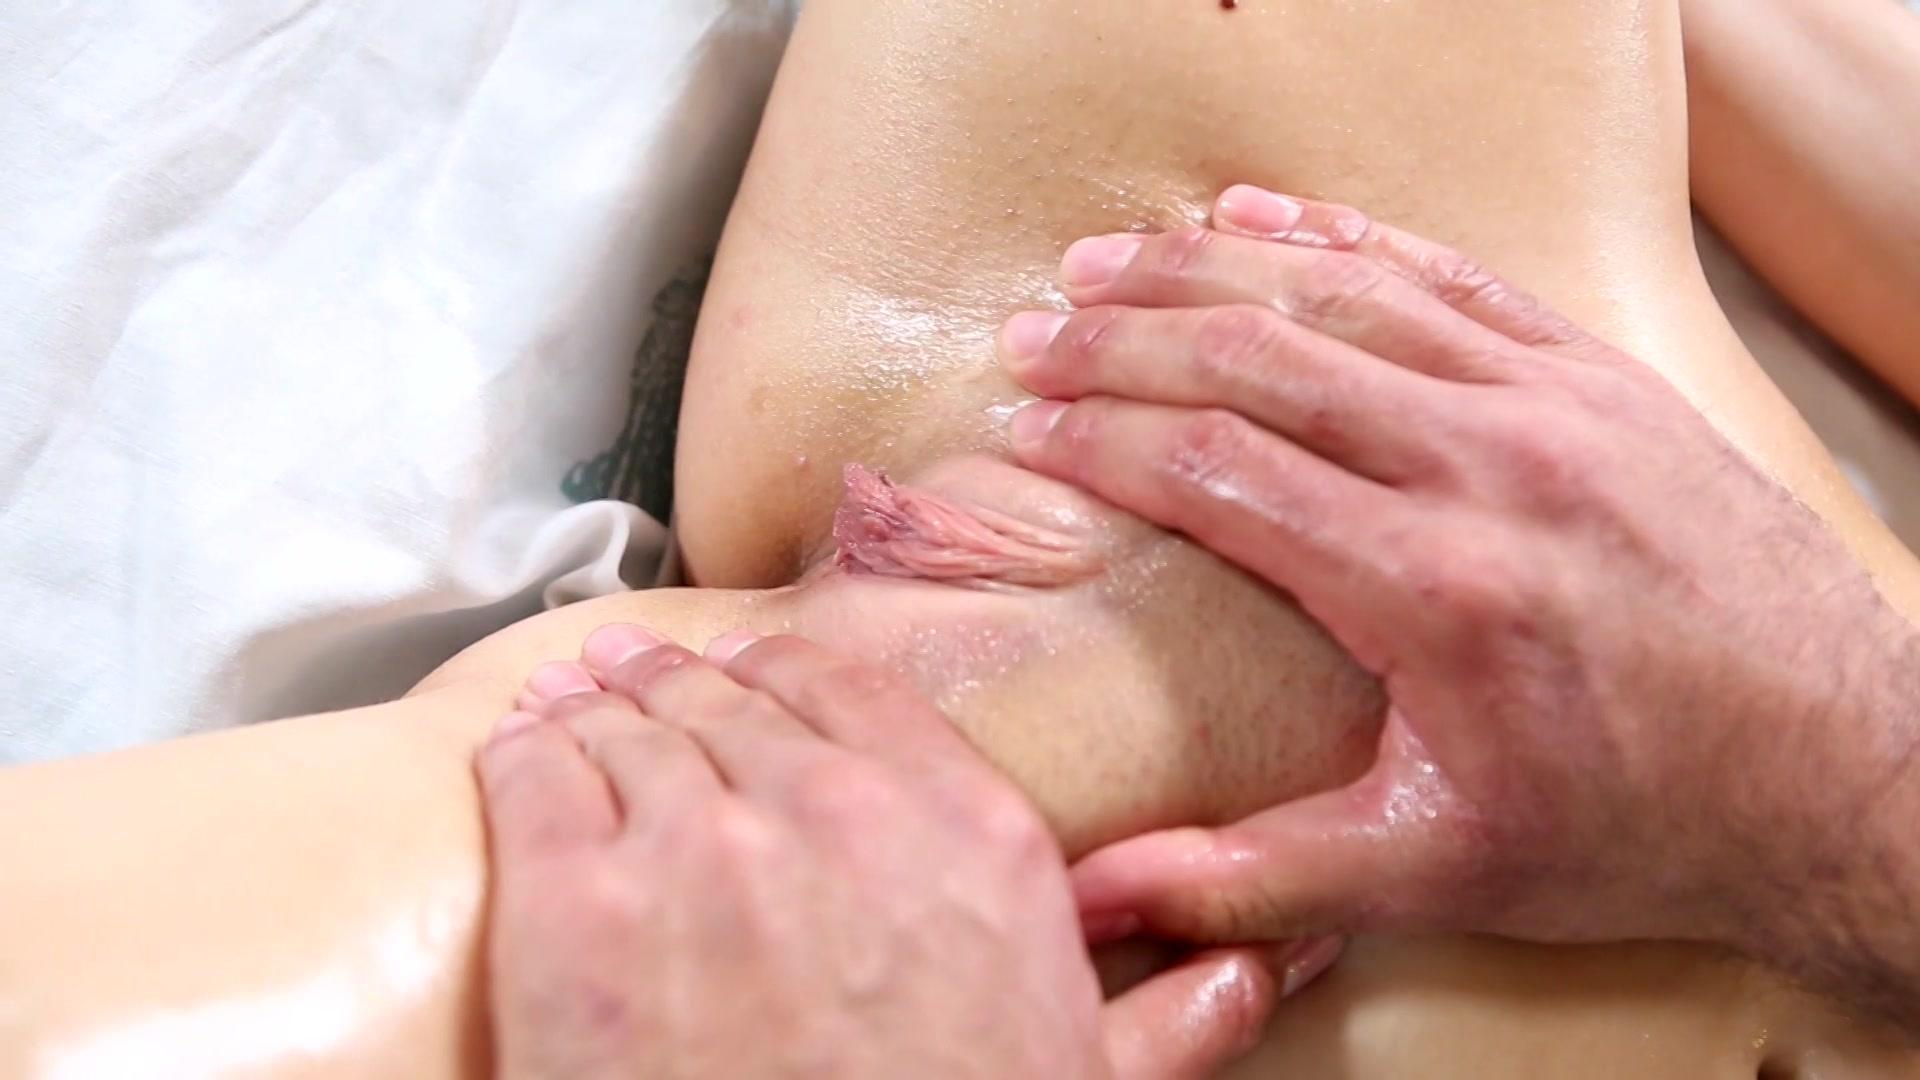 video-massazh-vagini-v-kustah-super-gigantskie-chleni-onlayn